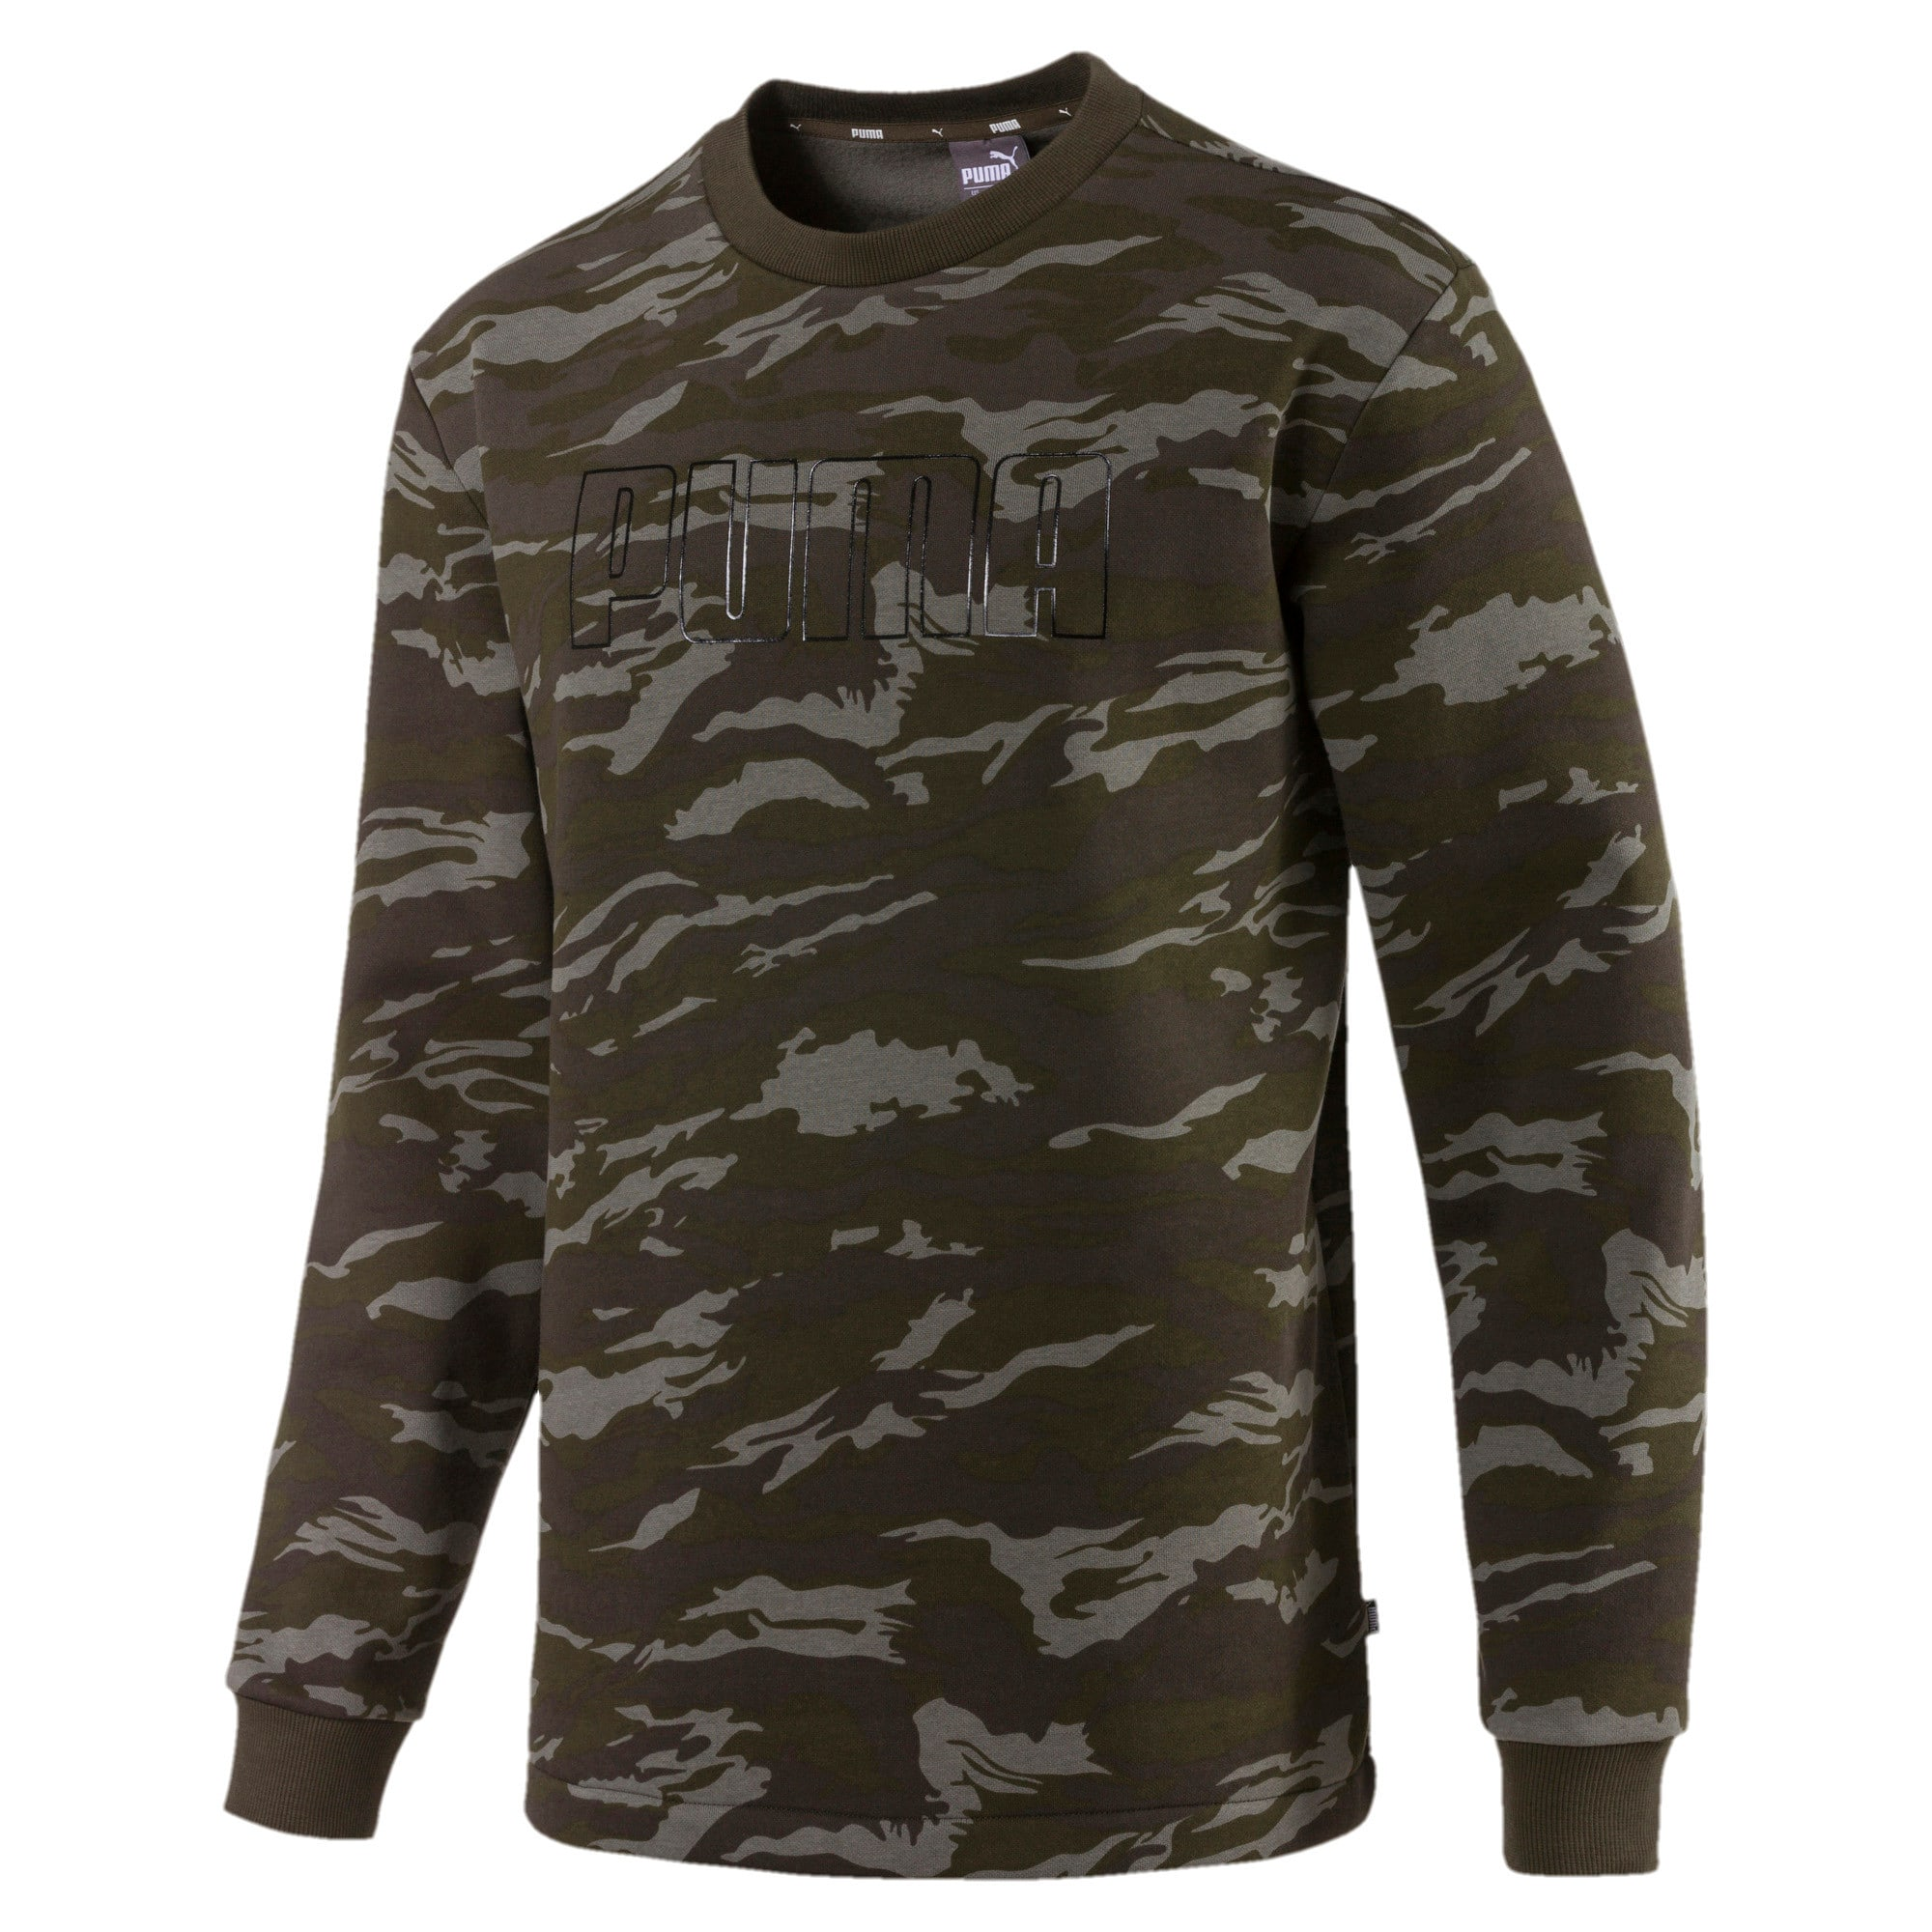 Thumbnail 1 of Camo Men's Fleece Crewneck Sweatshirt, Forest Night, medium